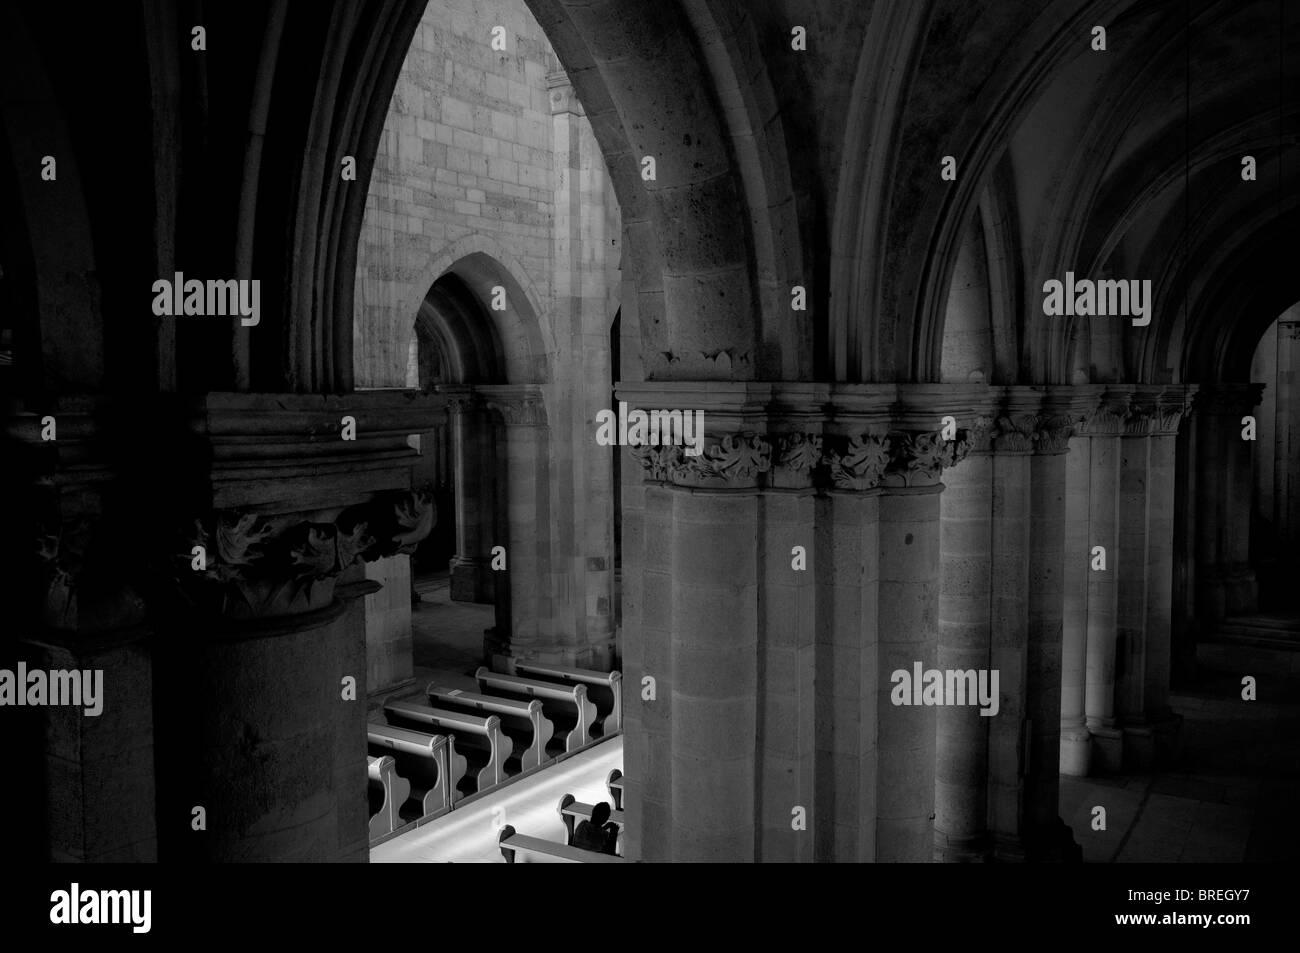 Romania, Transylvania Alba Iulia Cathedral - Stock Image